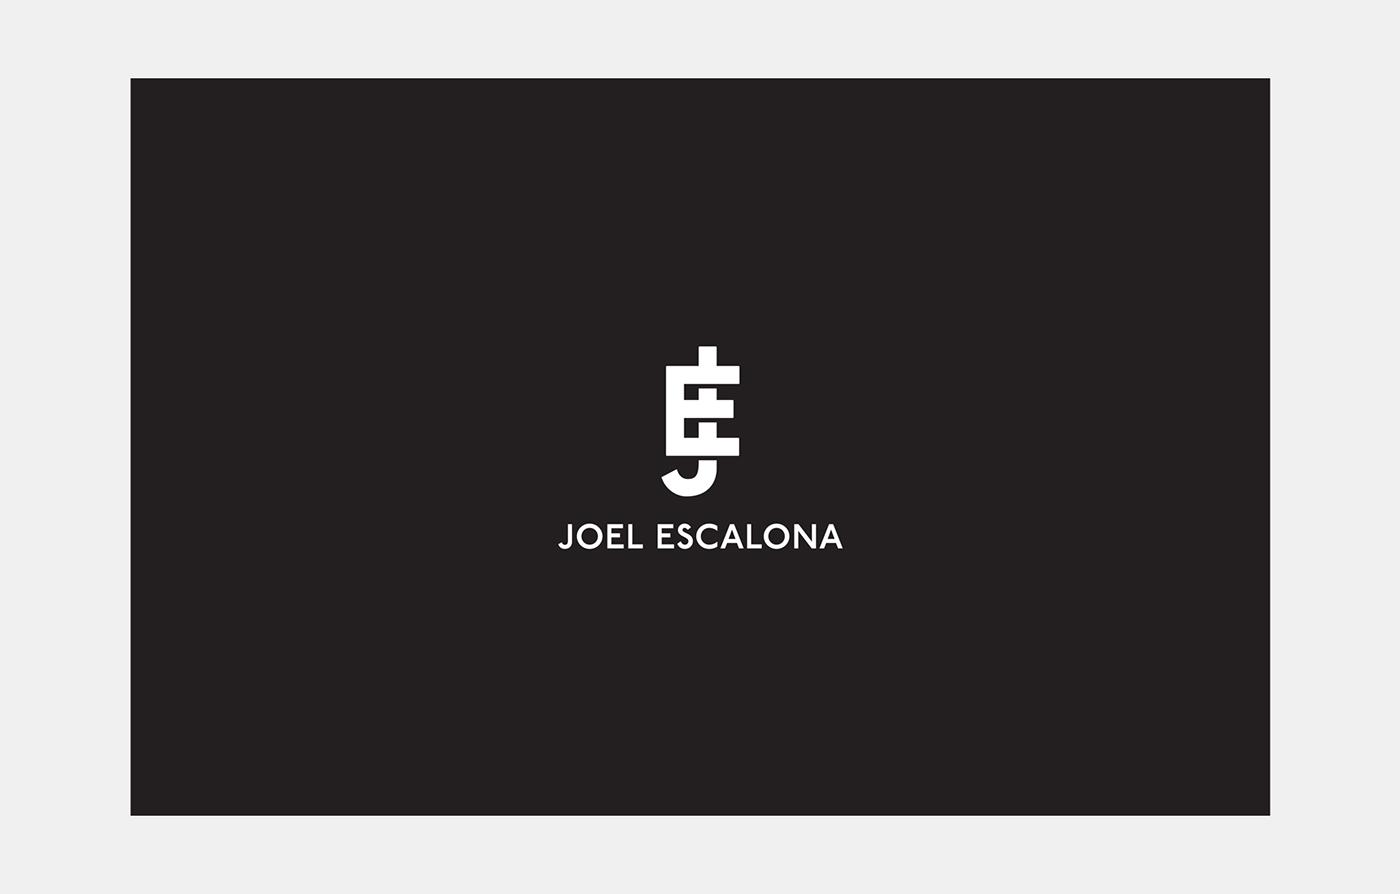 joel escalona identity logo